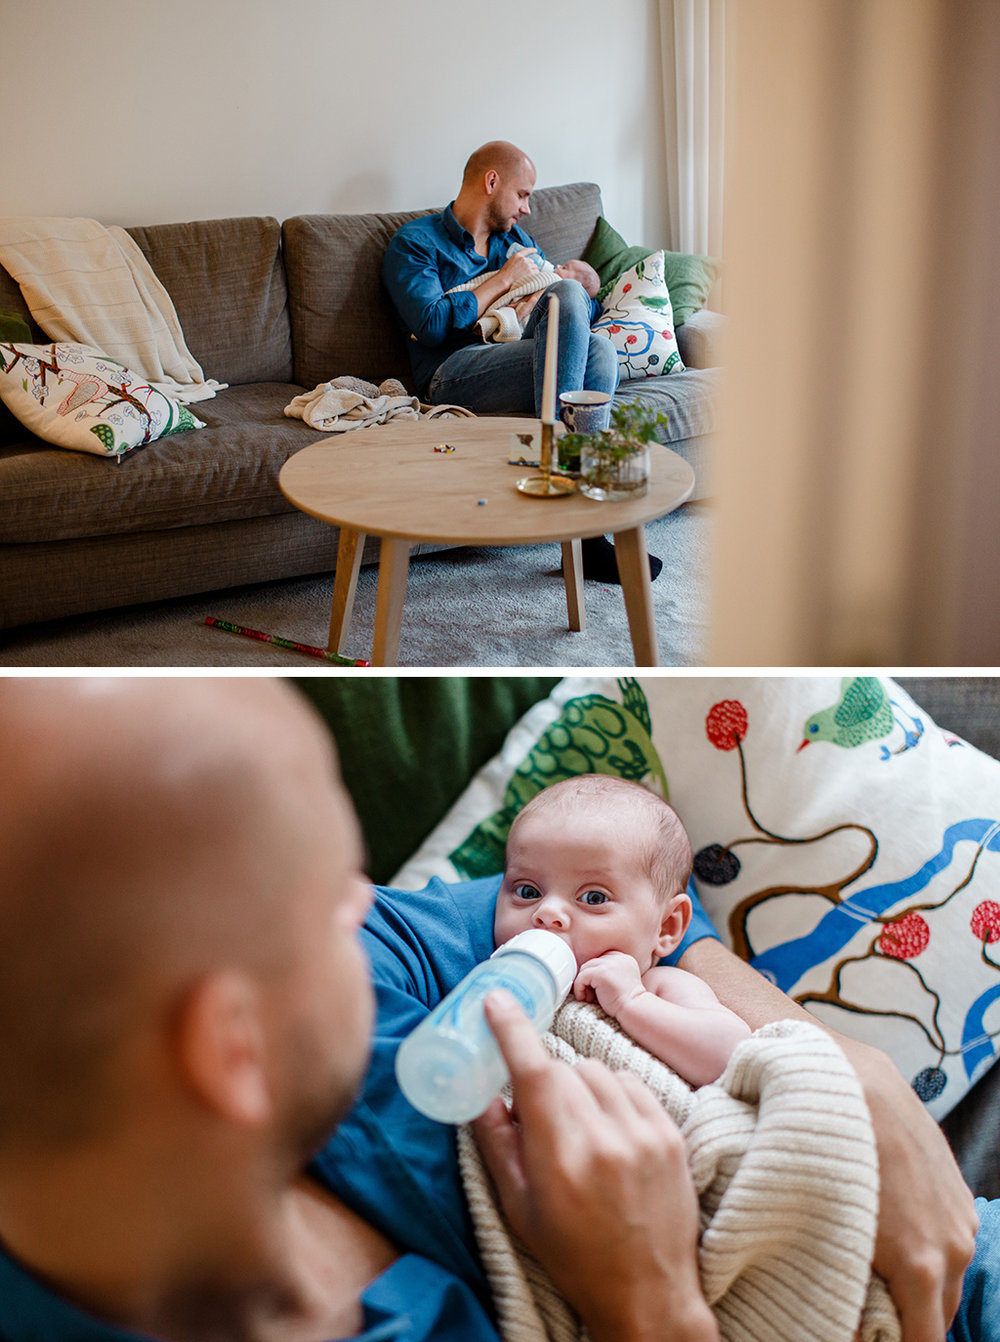 Lifestyle-nyfoddfotografering_newbornphotography_familjefotograf_Stockholm_9.jpg